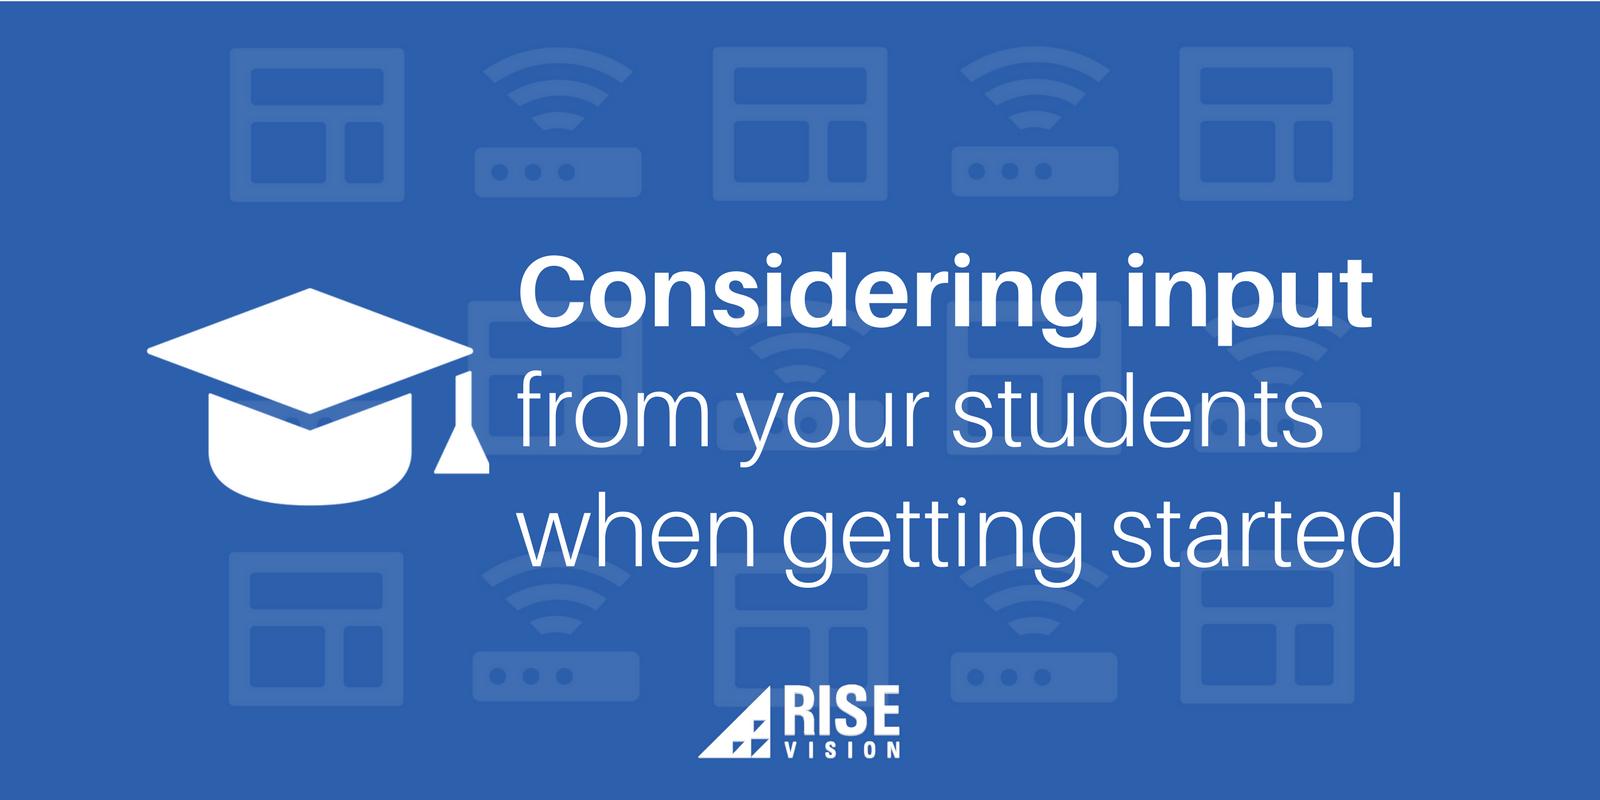 Rise Vision Digital Signage Education Student Input.png